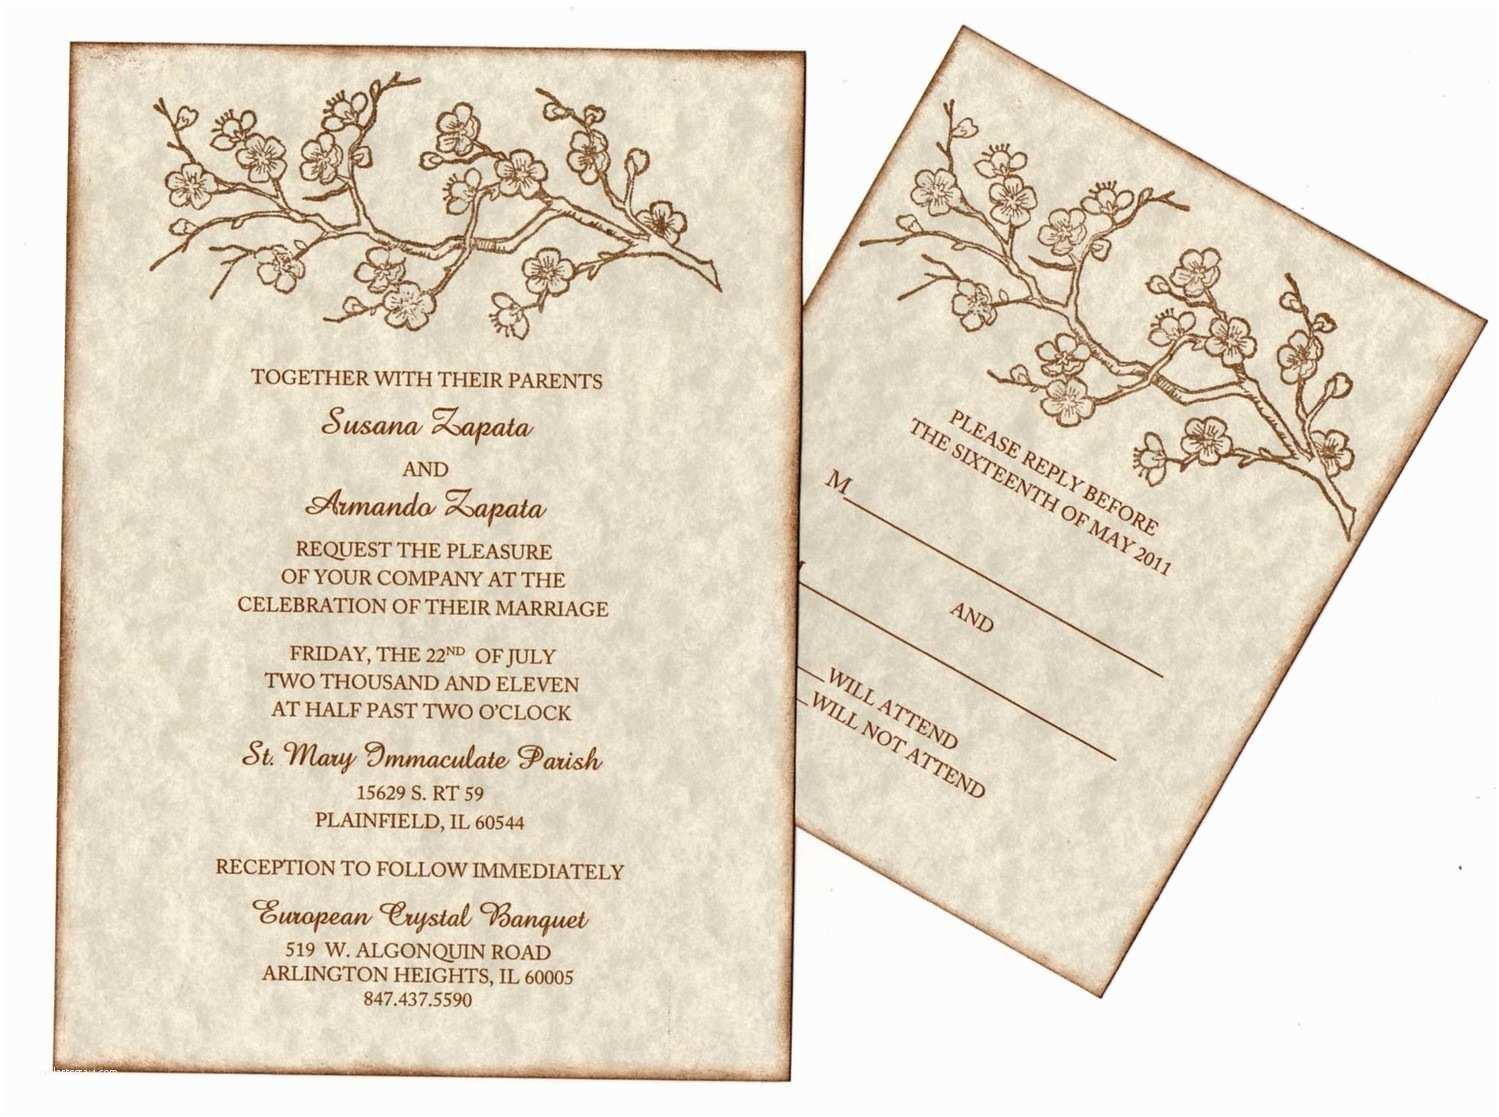 Wedding Invitation Styles south Indian Wedding Invitation Cards Designs Yourweek